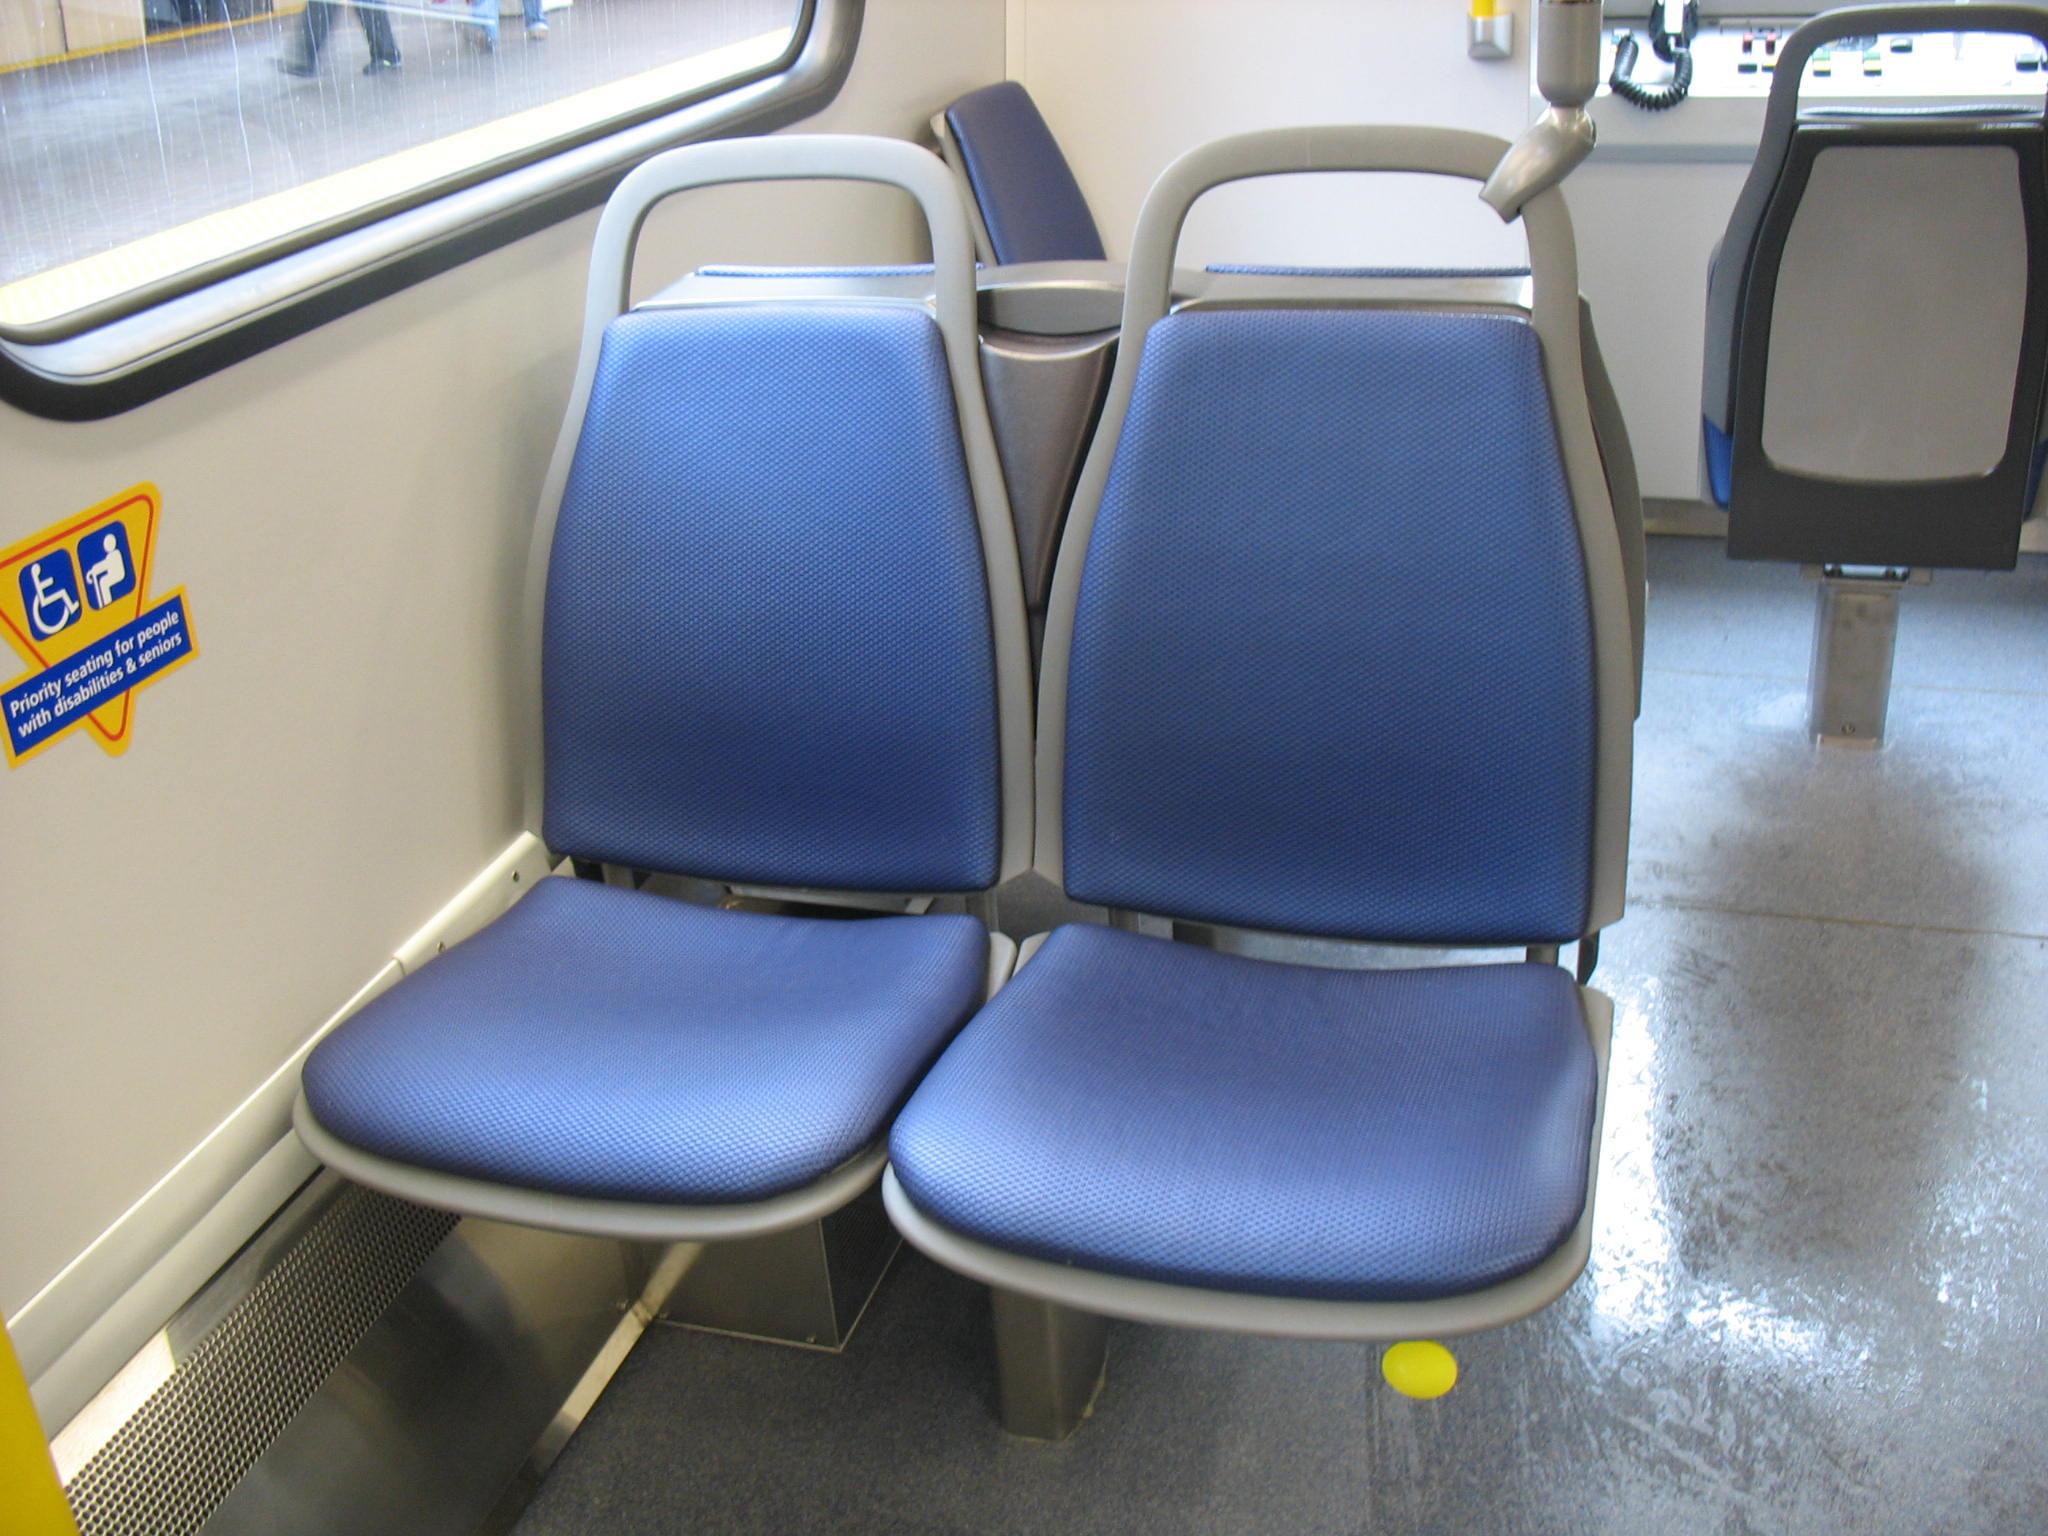 New chair designs!